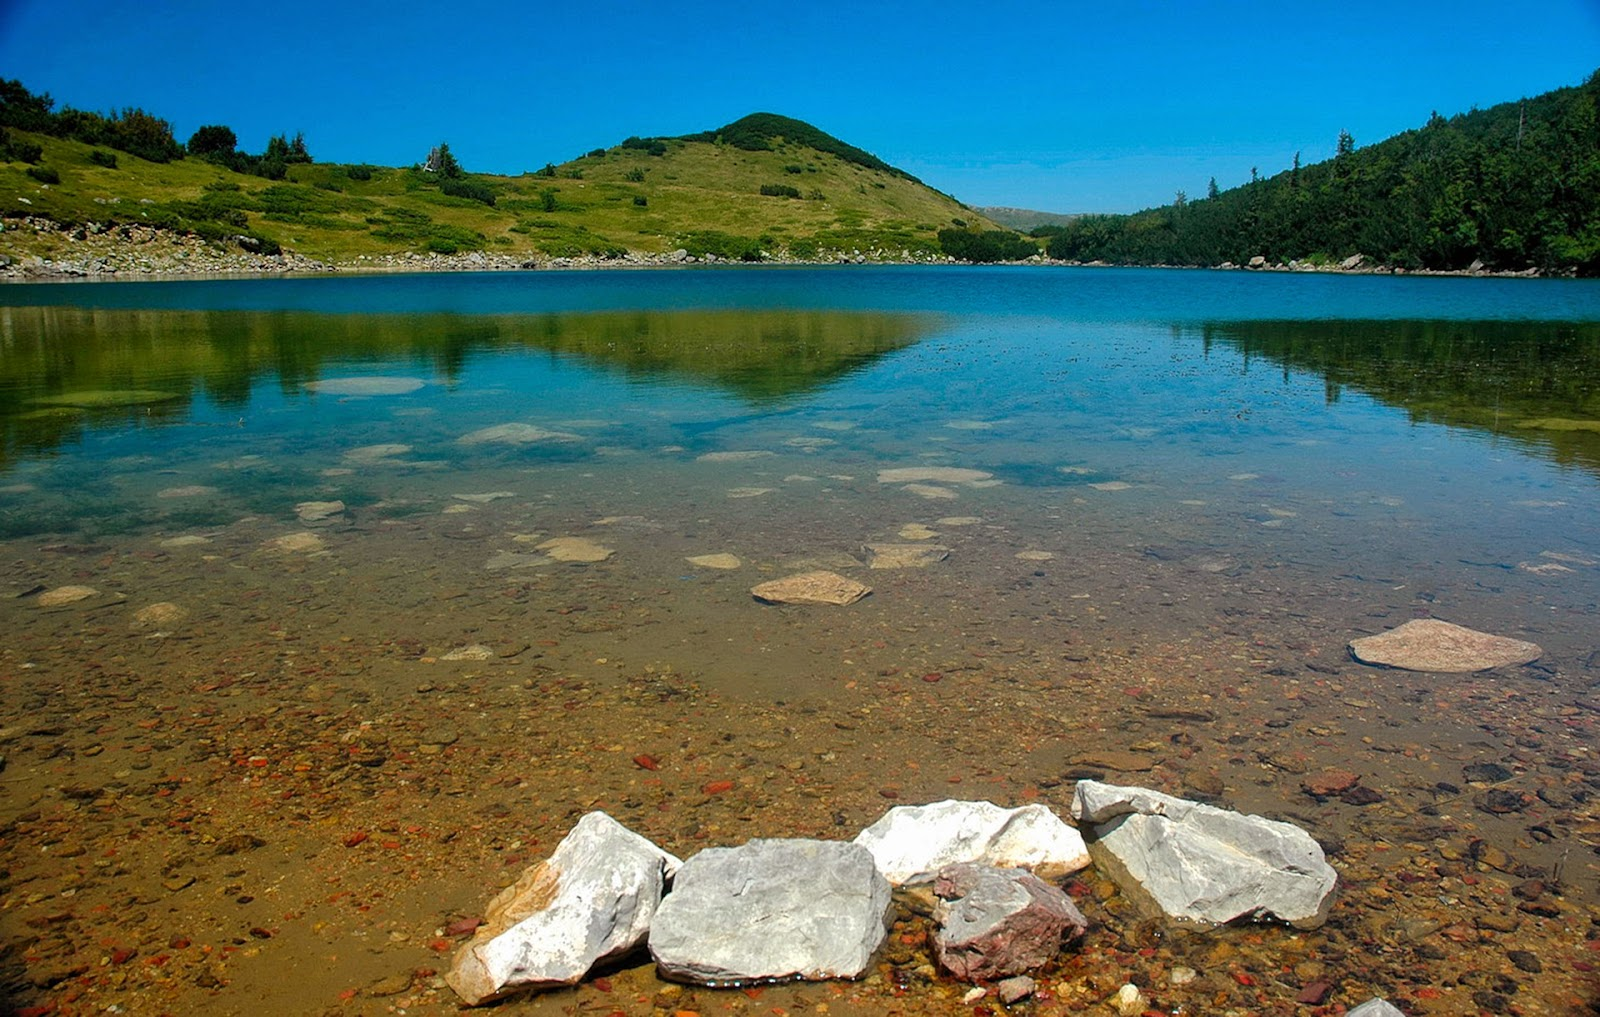 Full HD Lake Mountains Nature Desktop Backgrounds Image Wallpaper Free